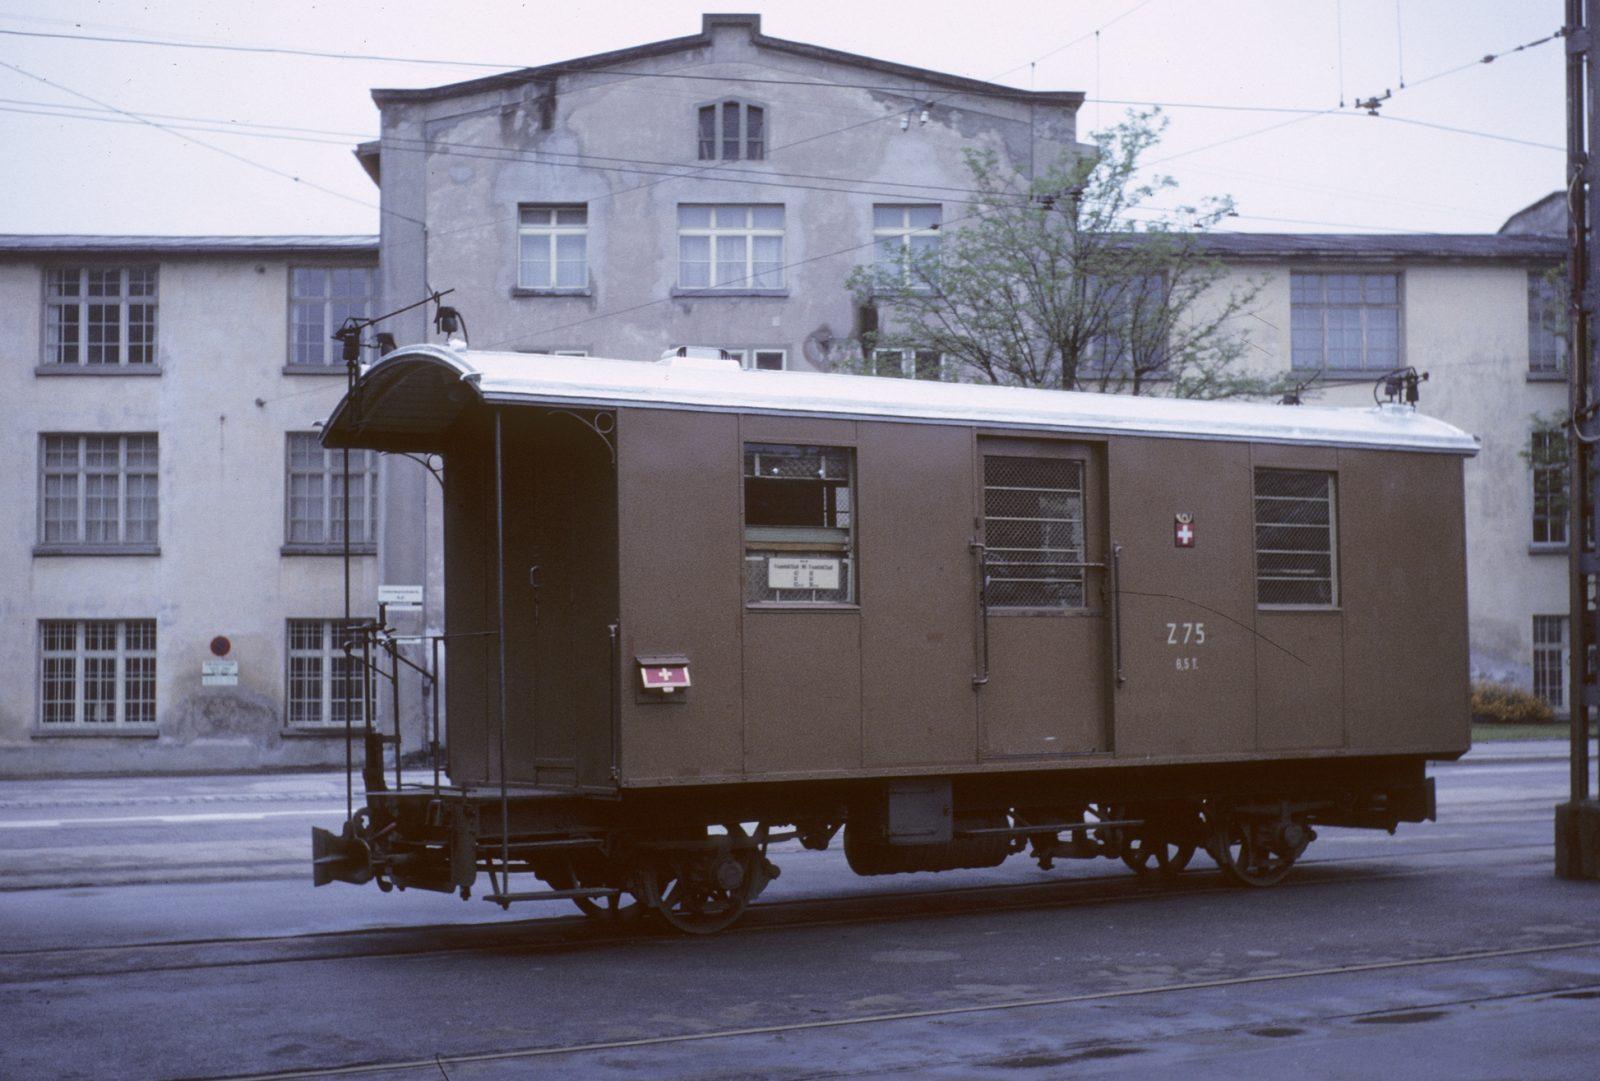 Postwagen Z 75